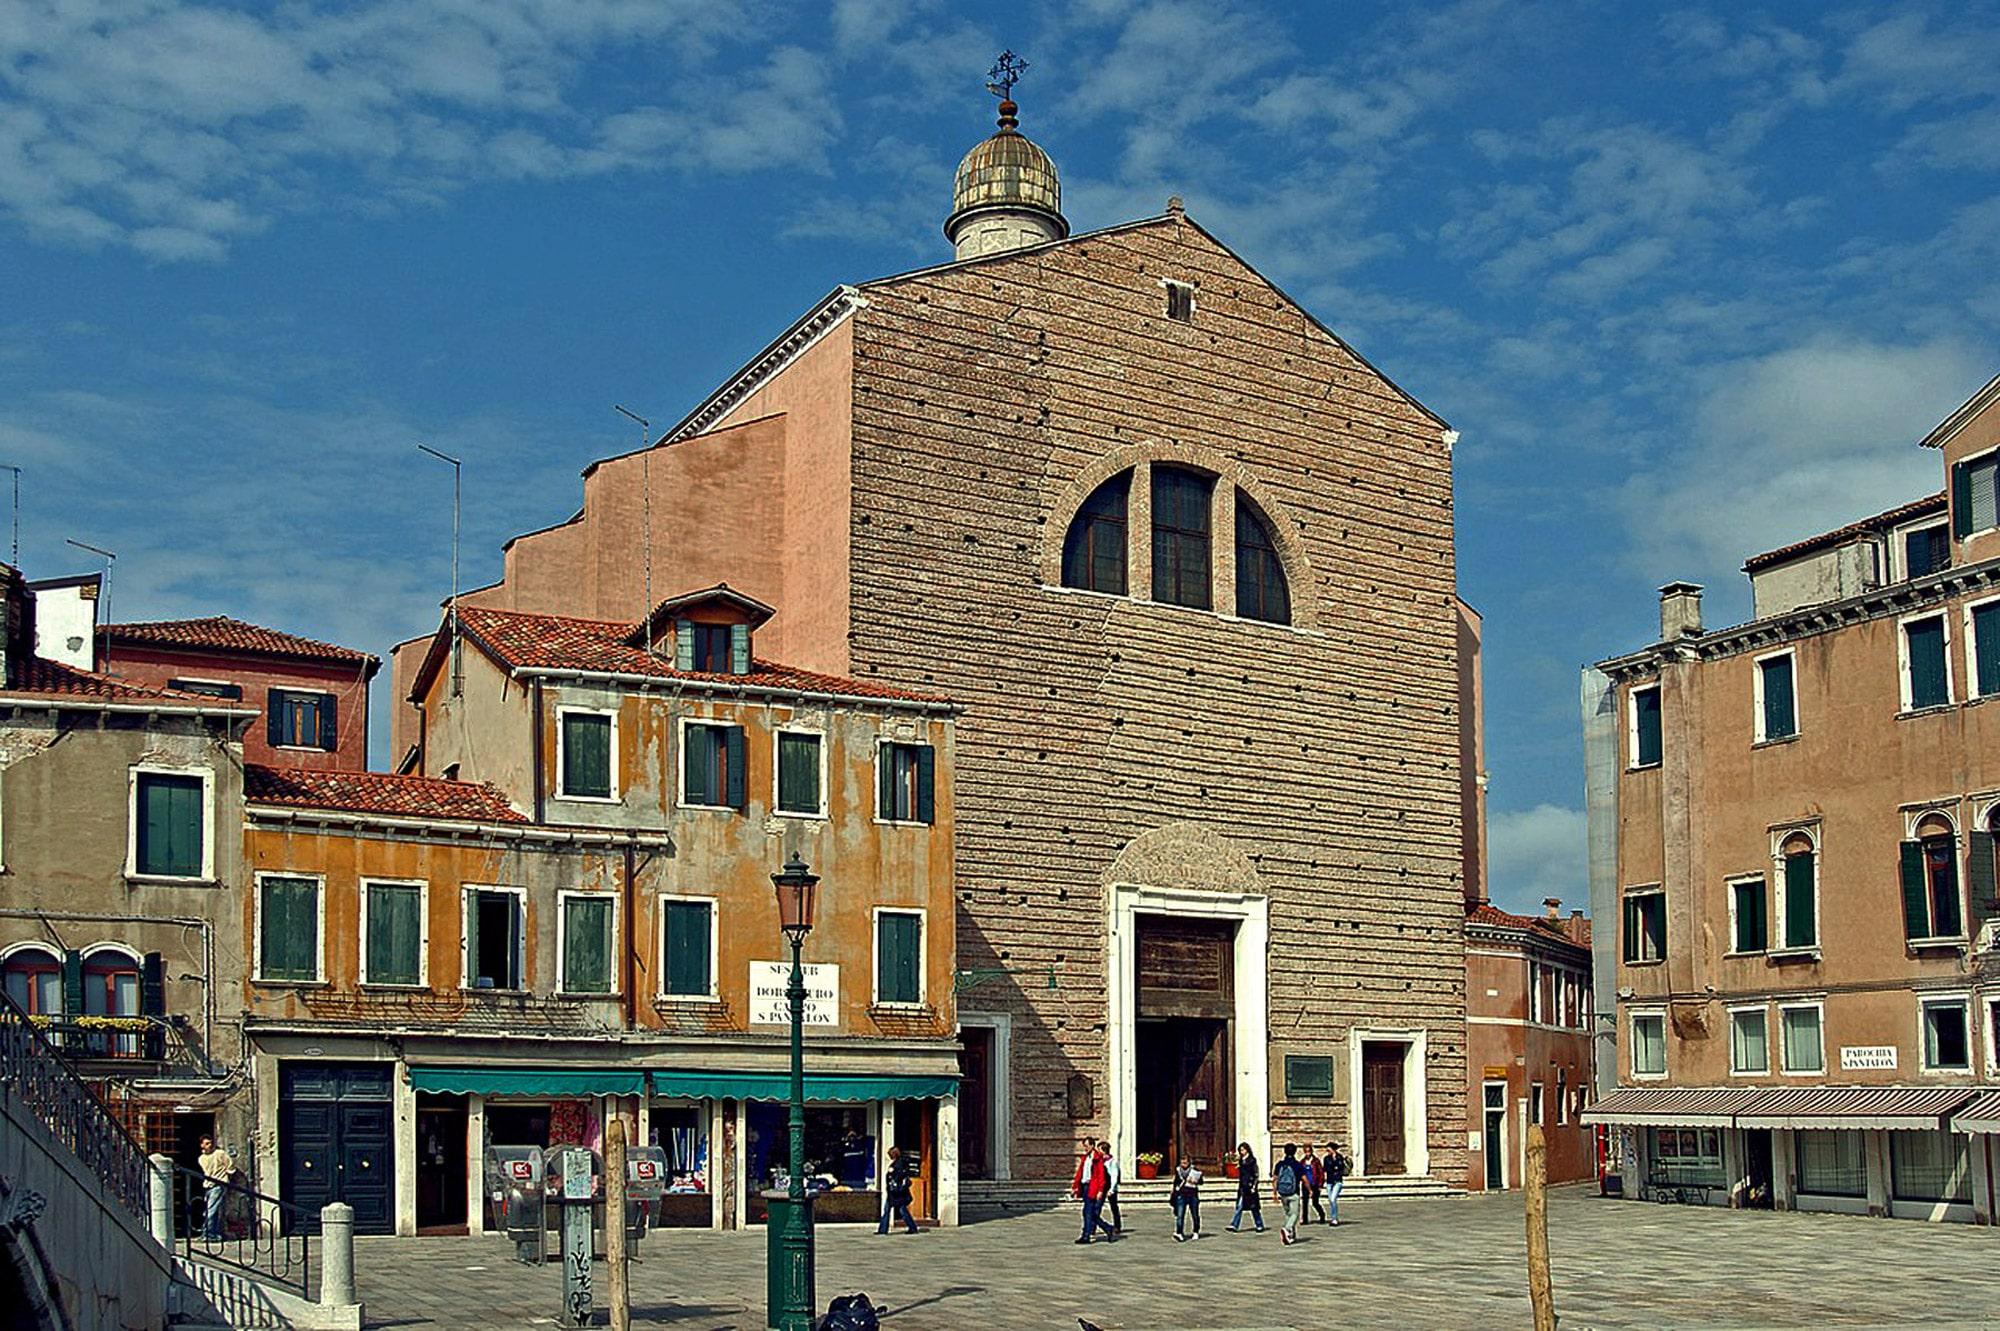 Chiesa_di_San_Pantalon_facade_2.jpg